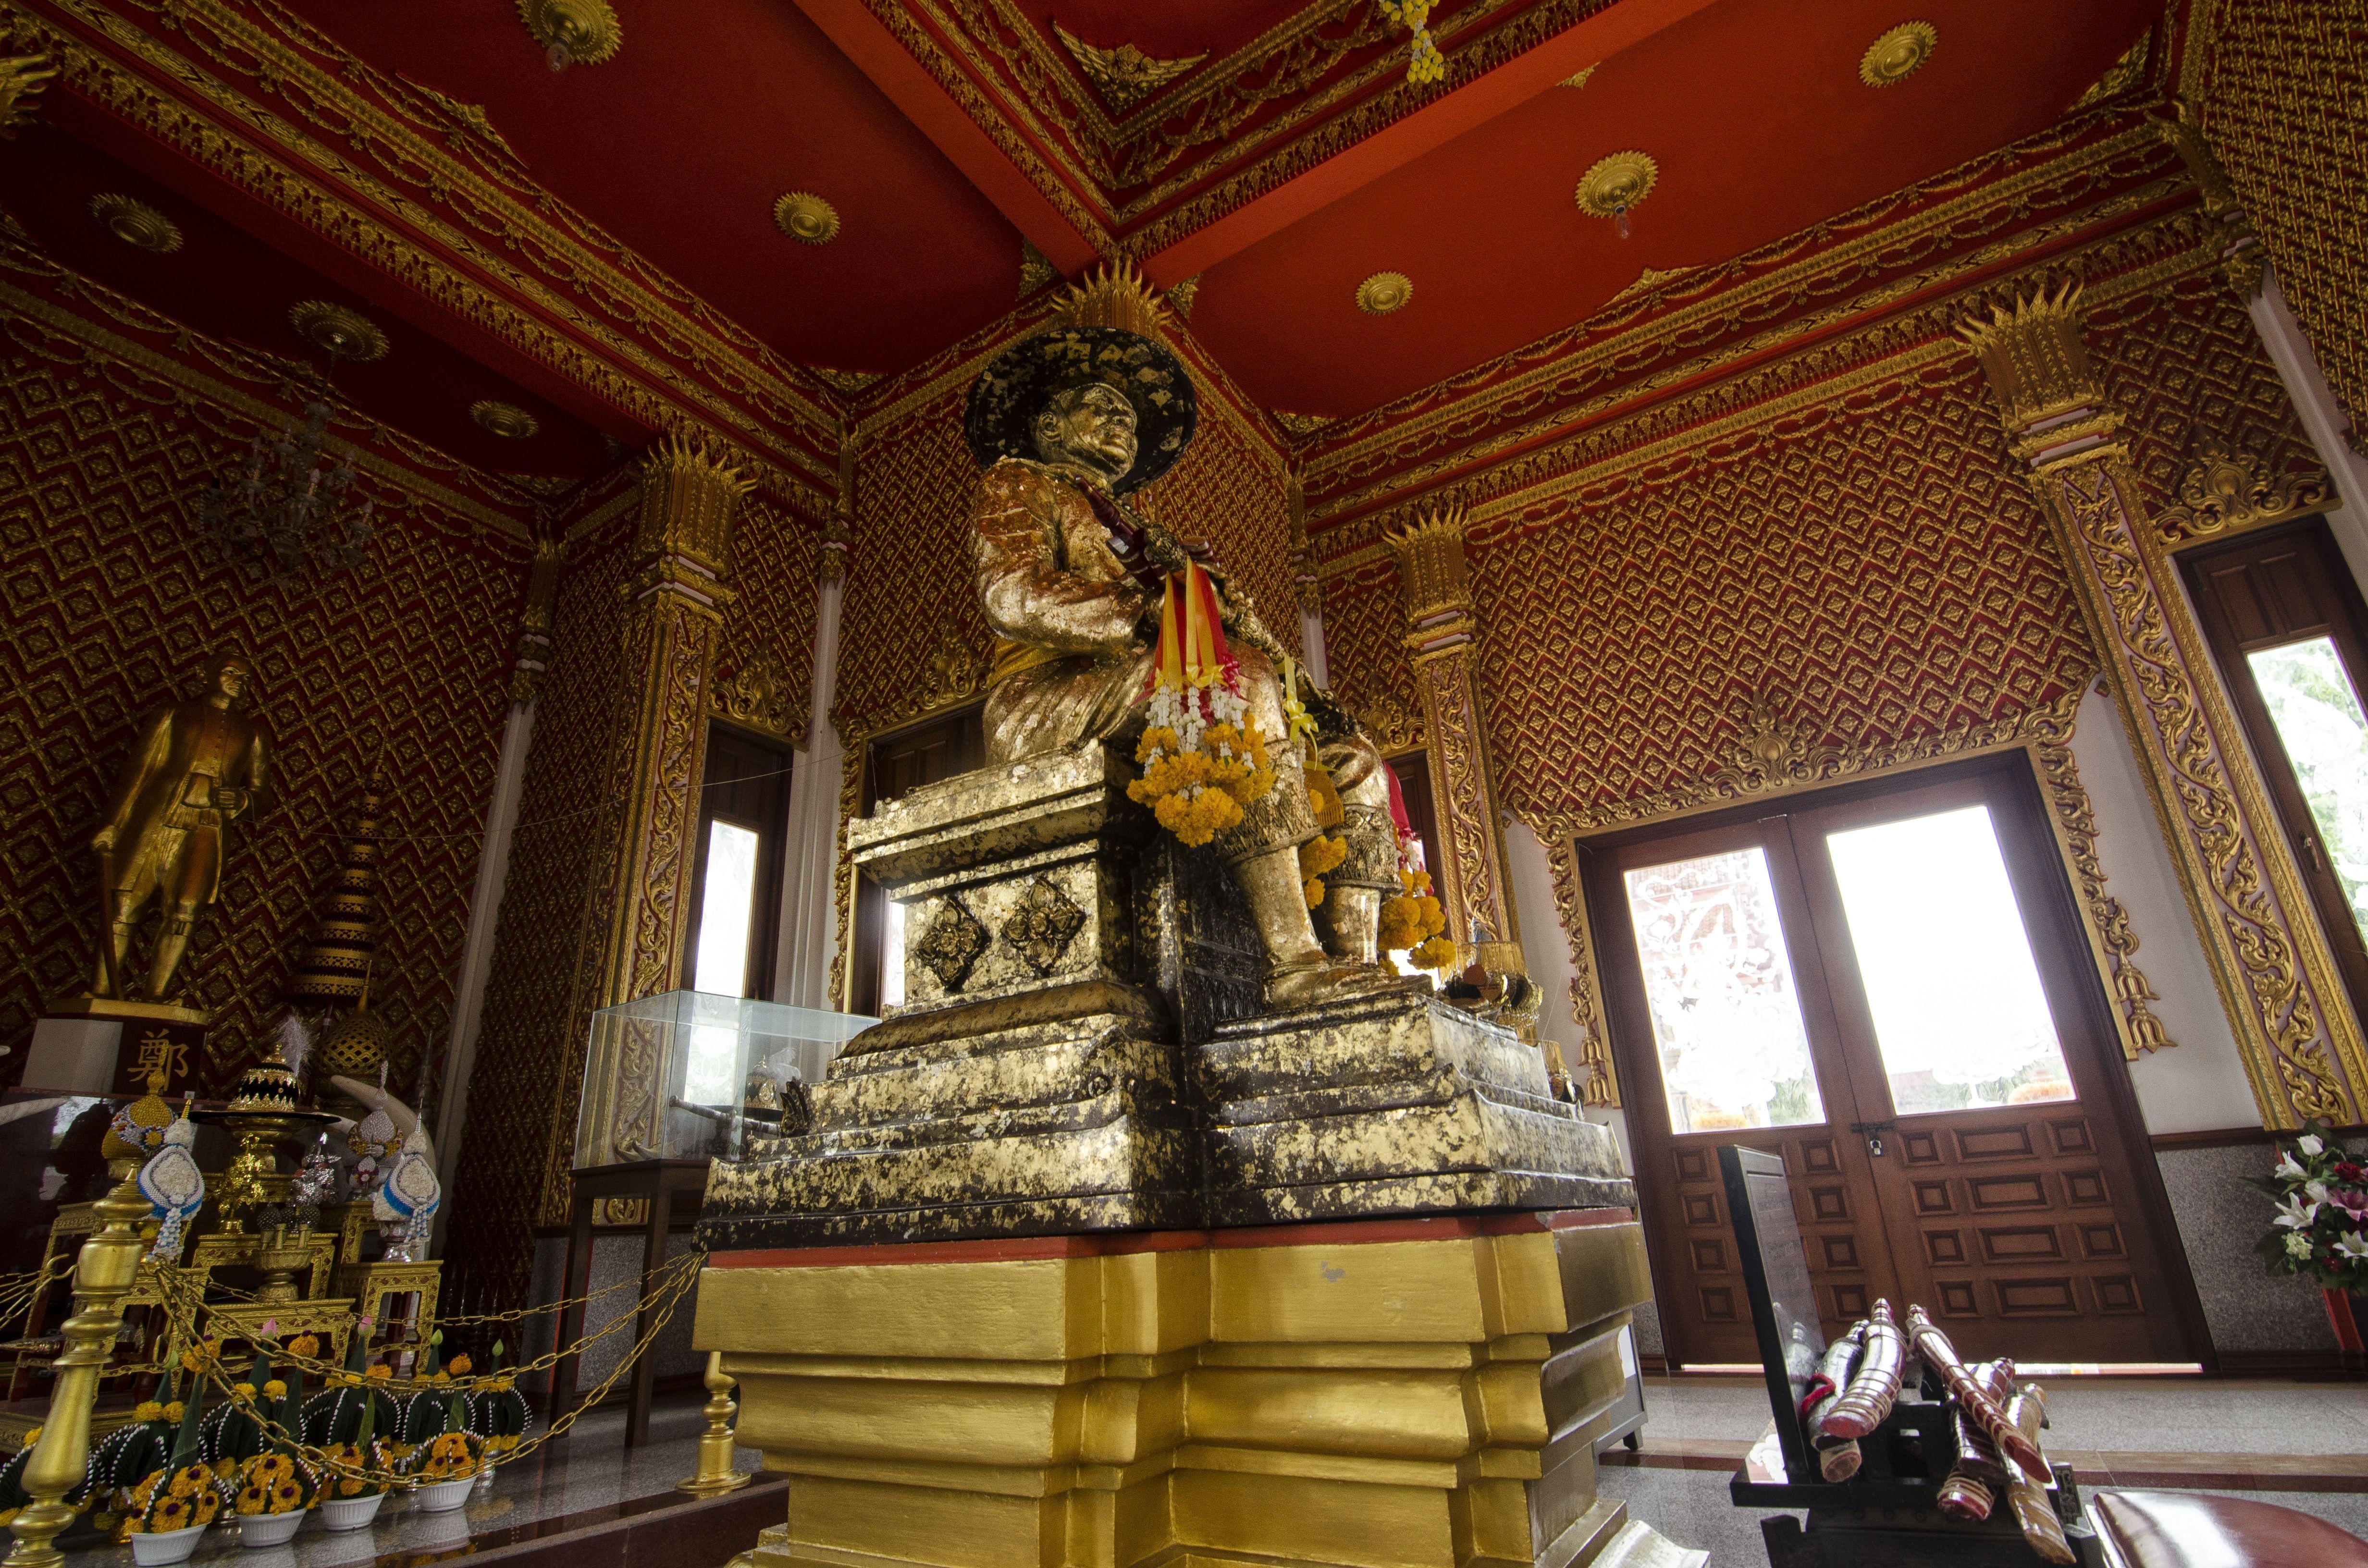 Shrine to King Taksin in Thailand